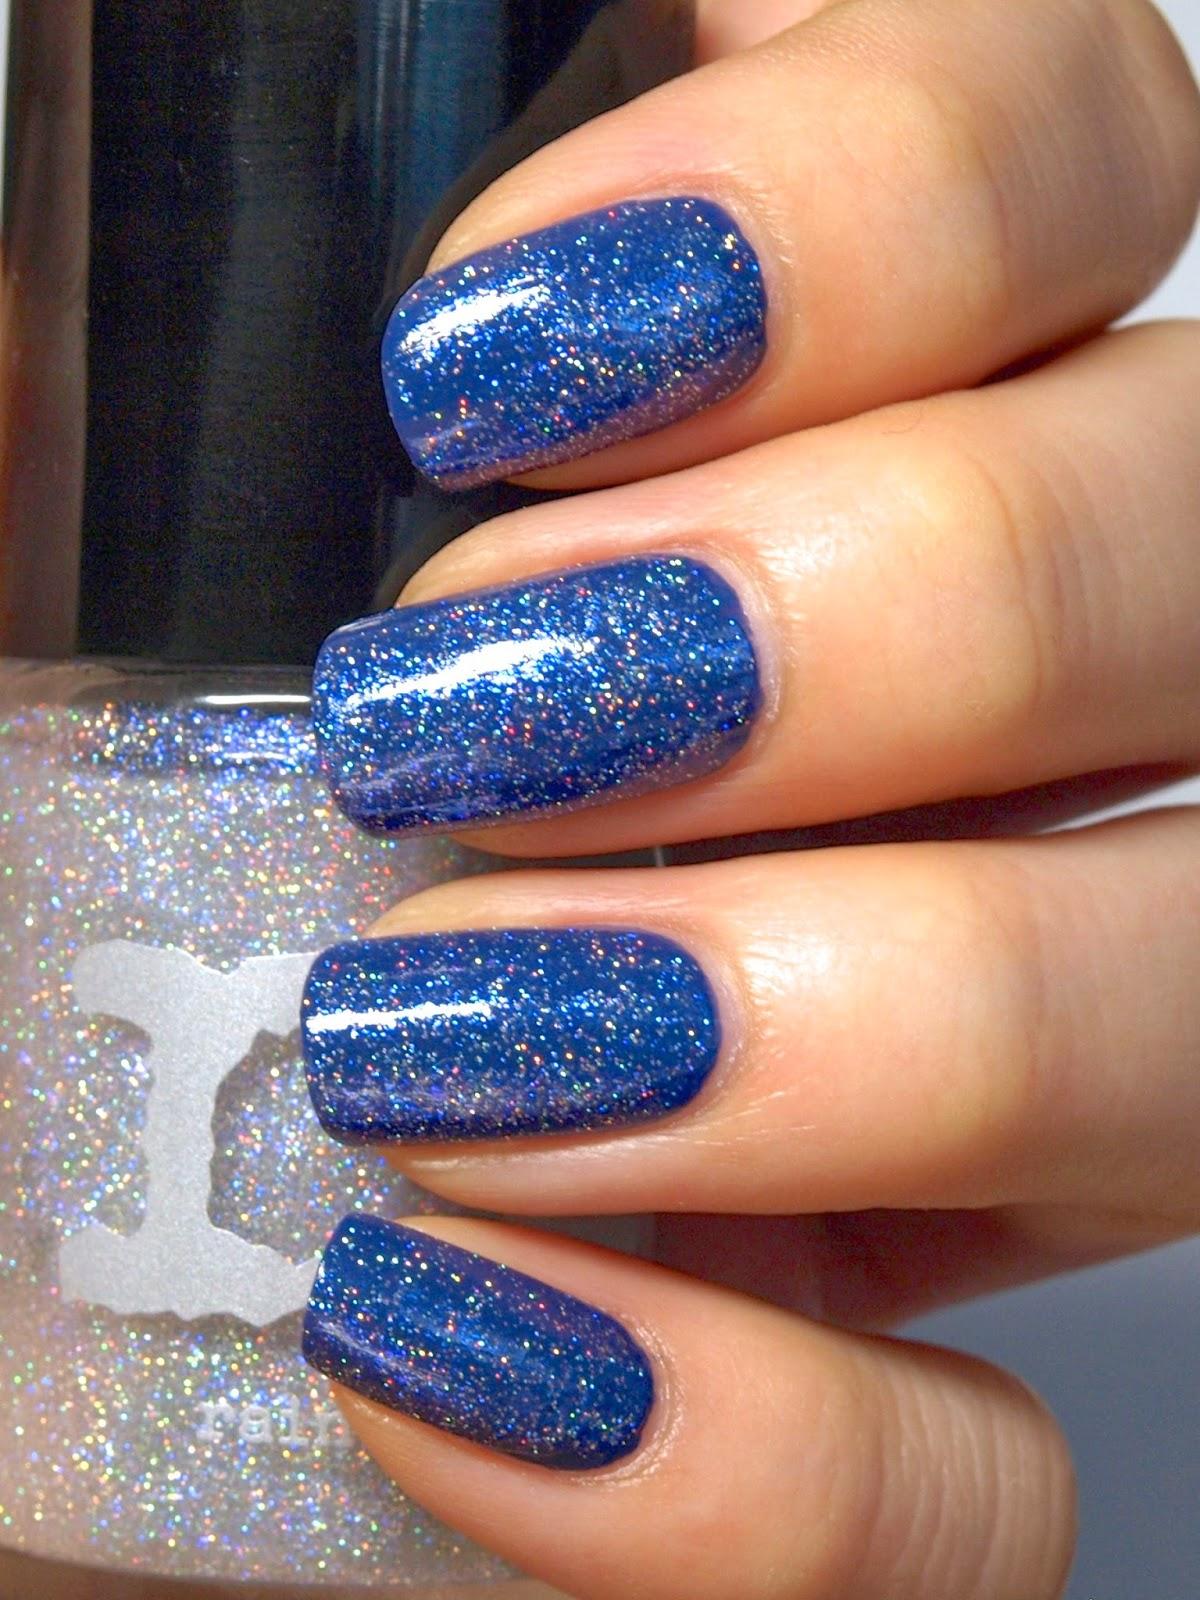 Diamond Dust Nails | Best Nail Designs 2018